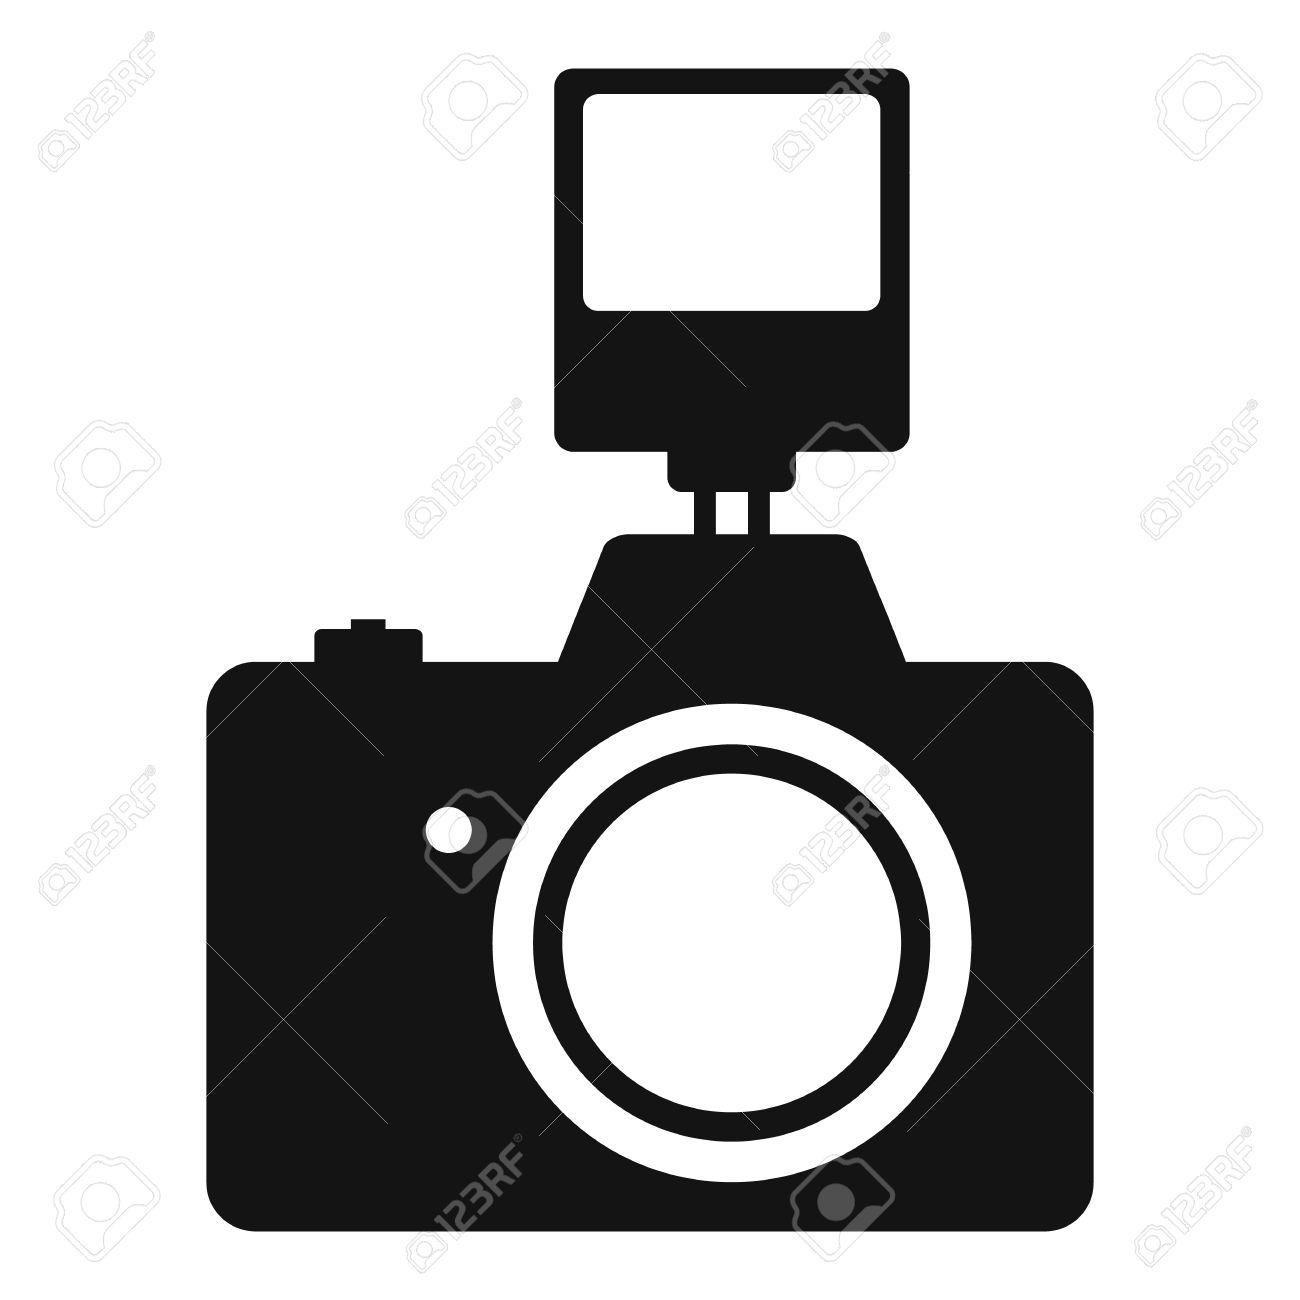 Slr Camera Cliparts | Free download best Slr Camera ...